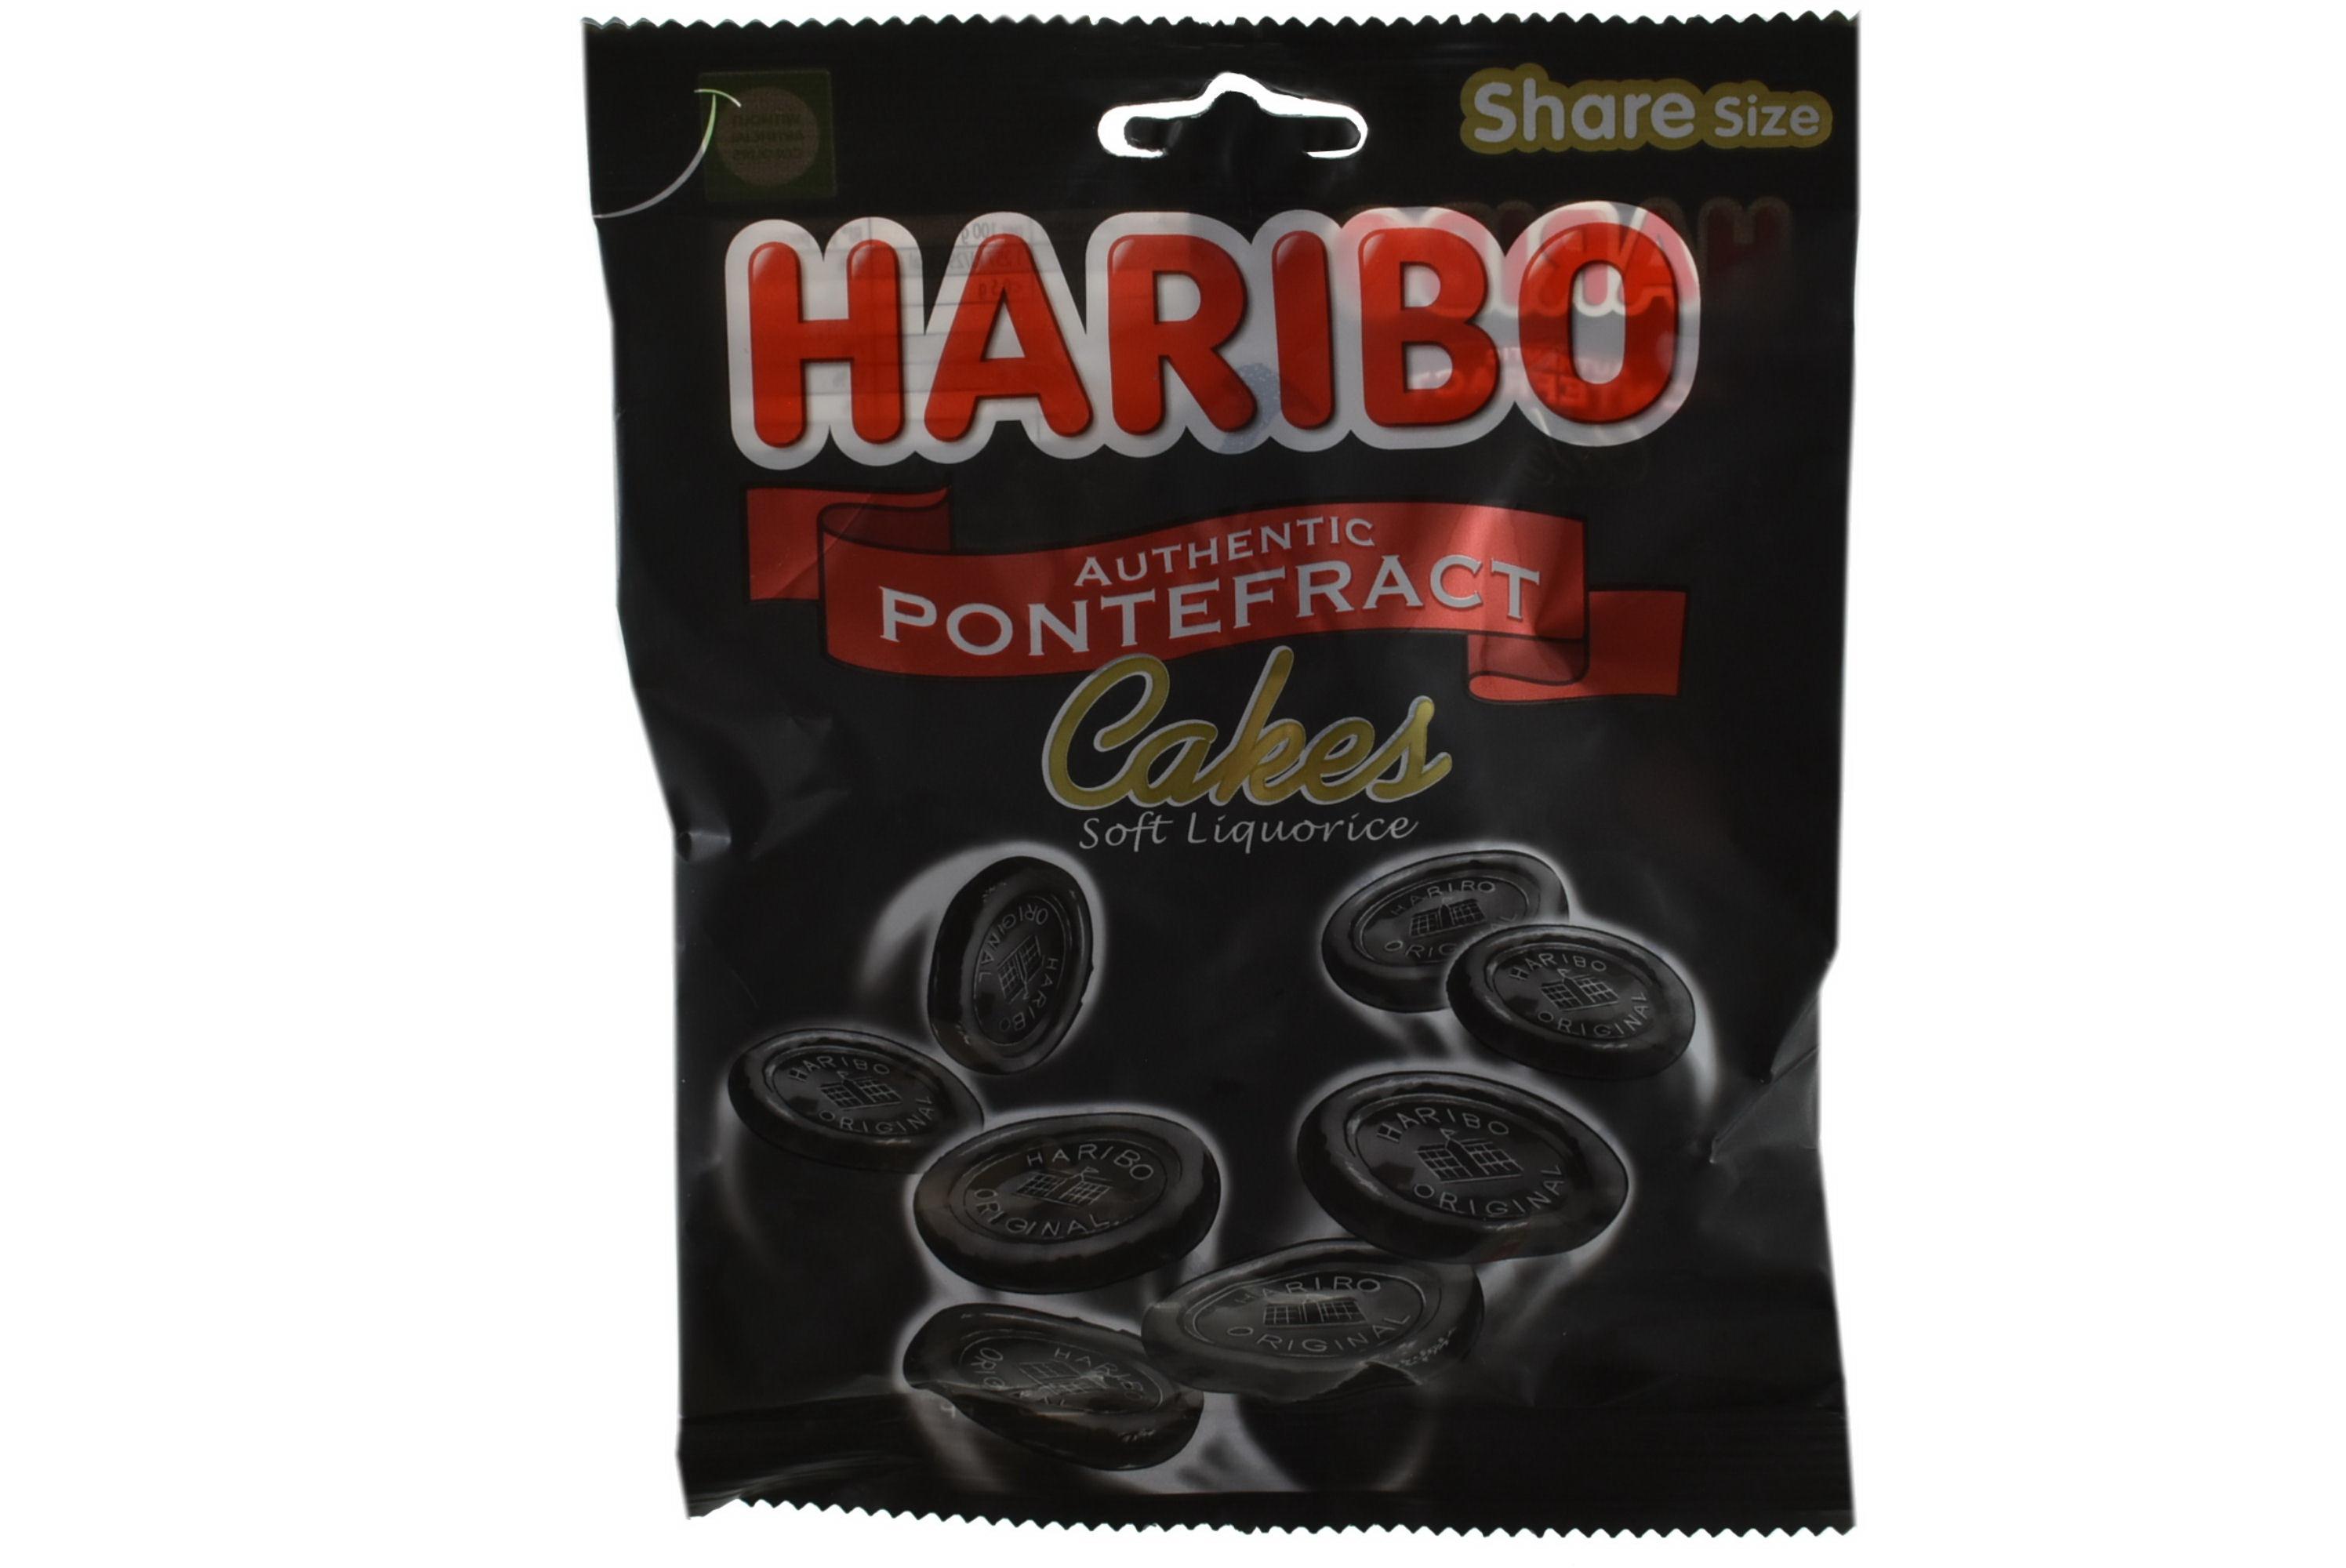 140g Pontefract Cakes Prepack - Haribo